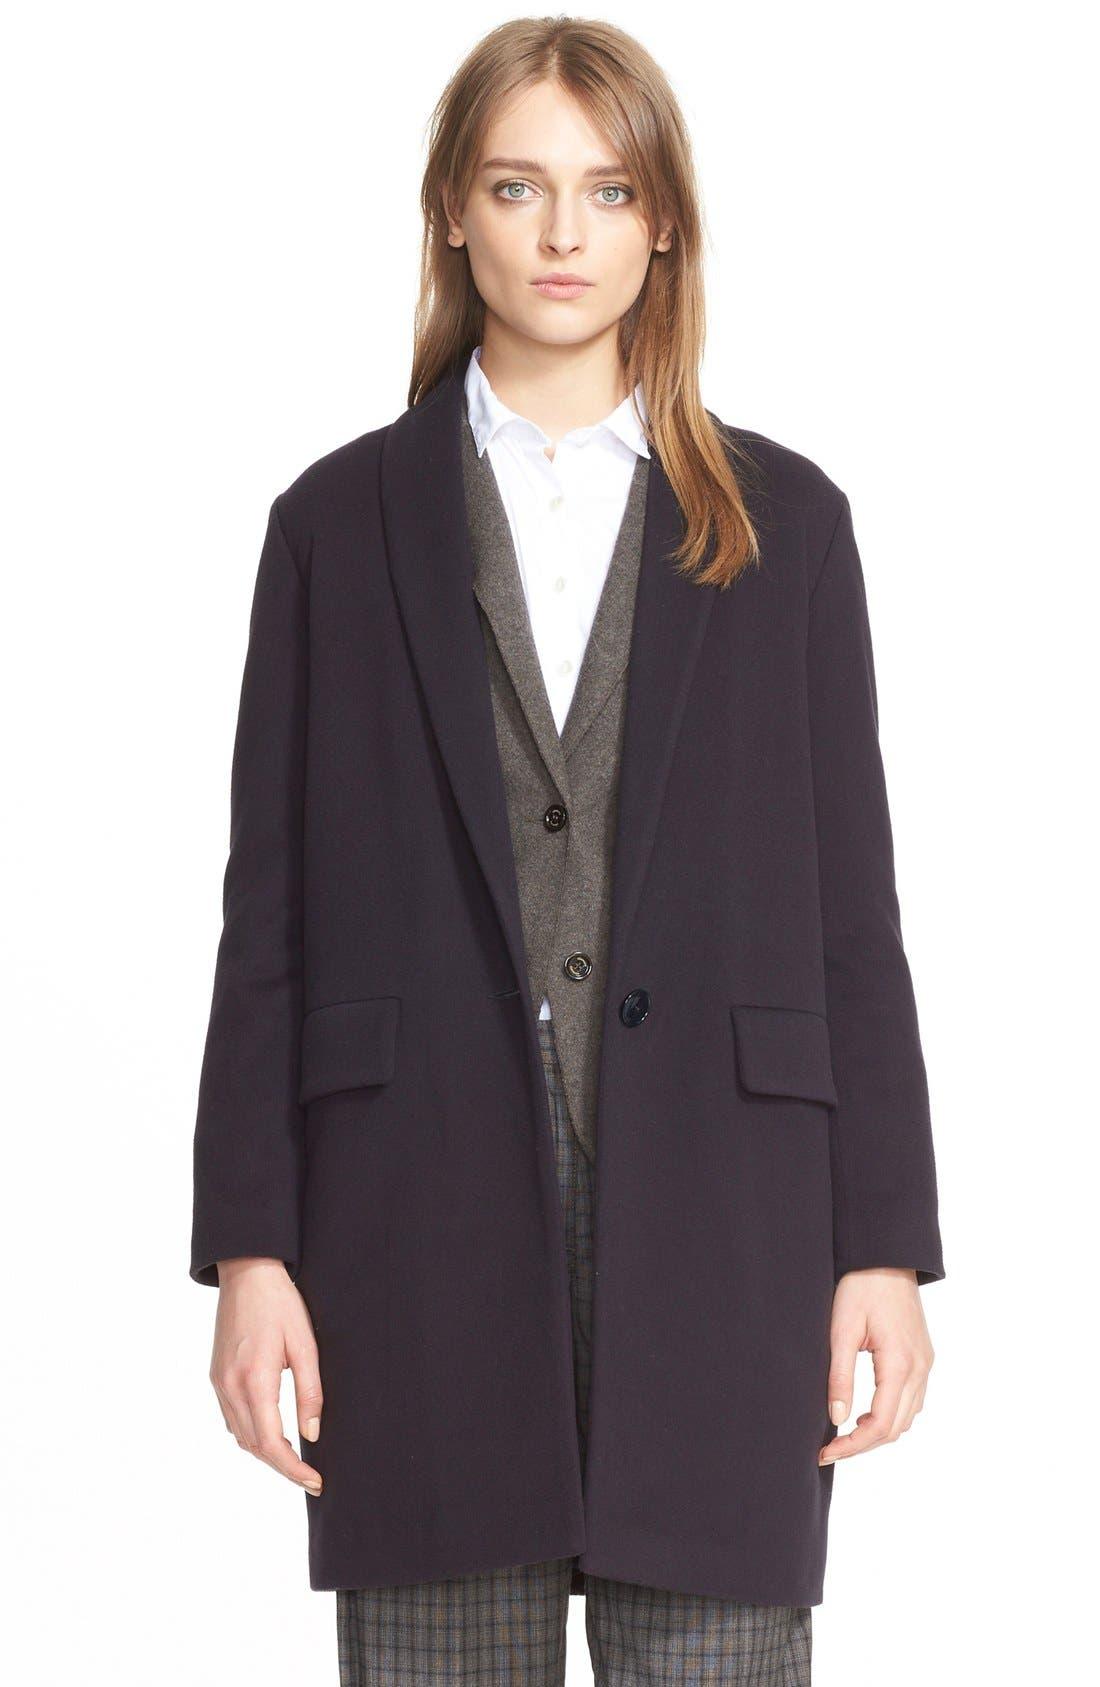 Alternate Image 1 Selected - Eleventy Houndstooth Wool Coat